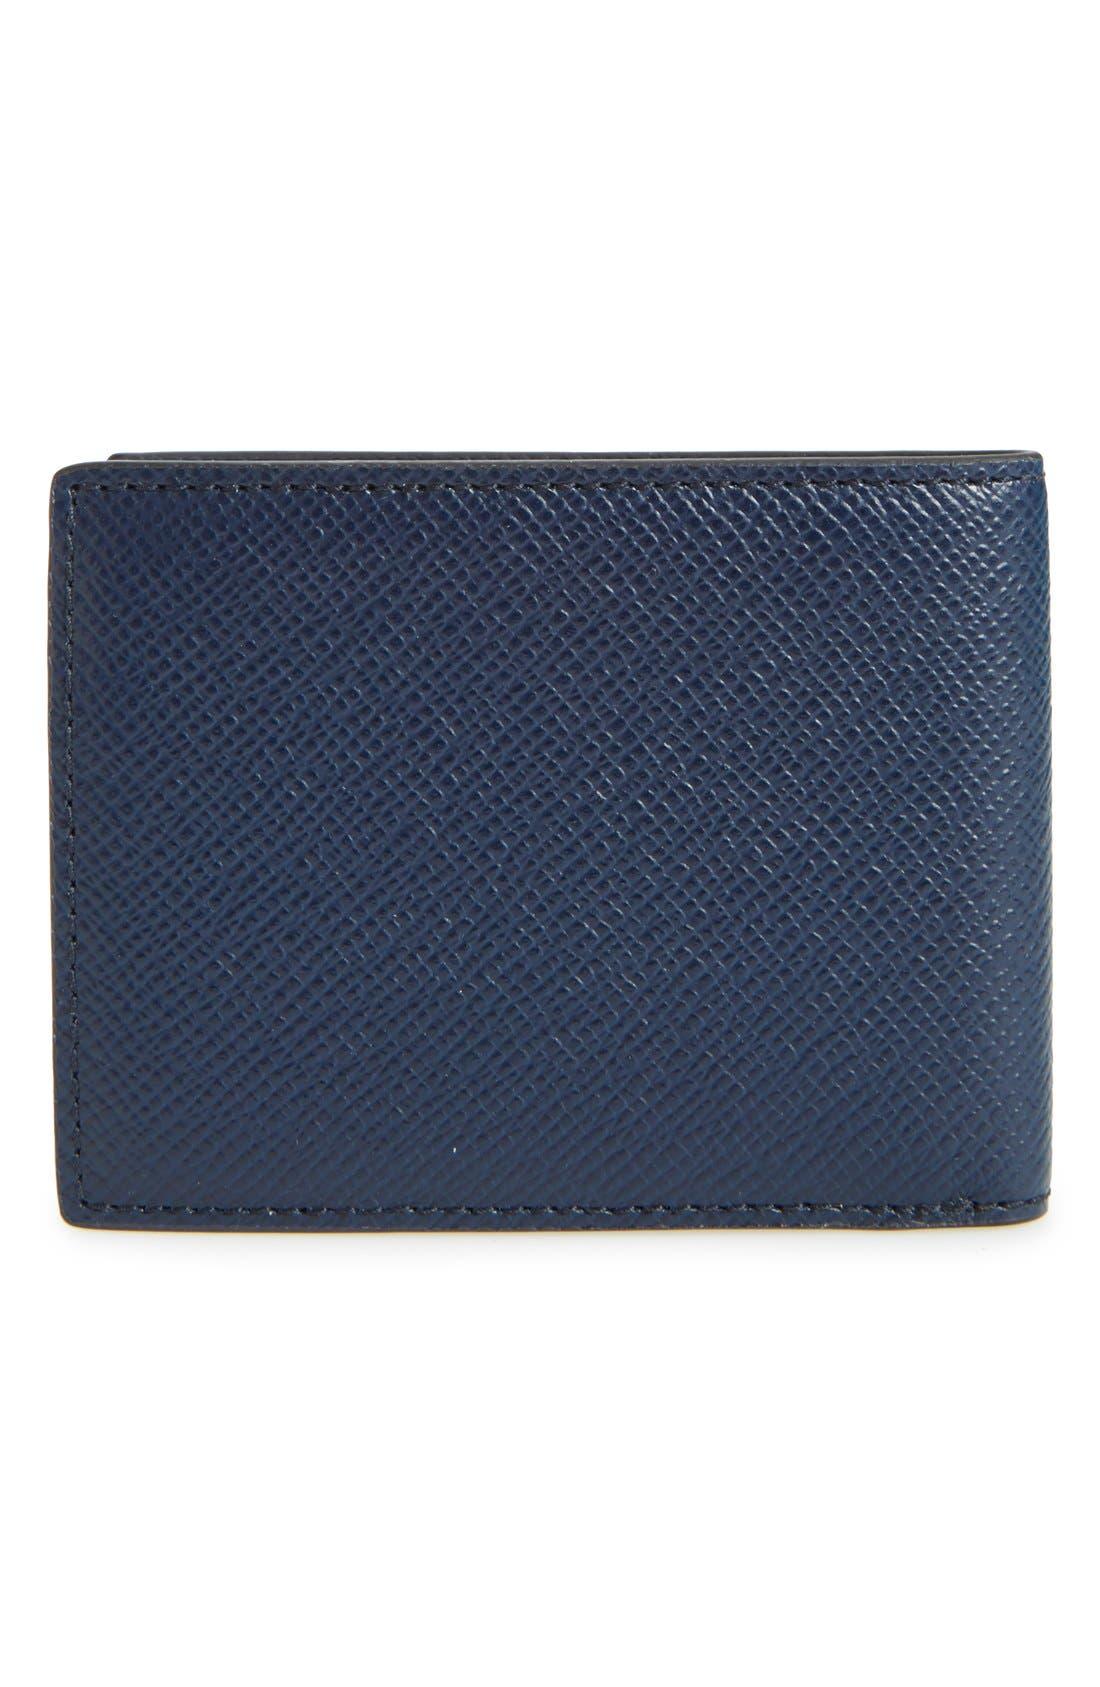 'Signature' Bifold Wallet,                             Alternate thumbnail 7, color,